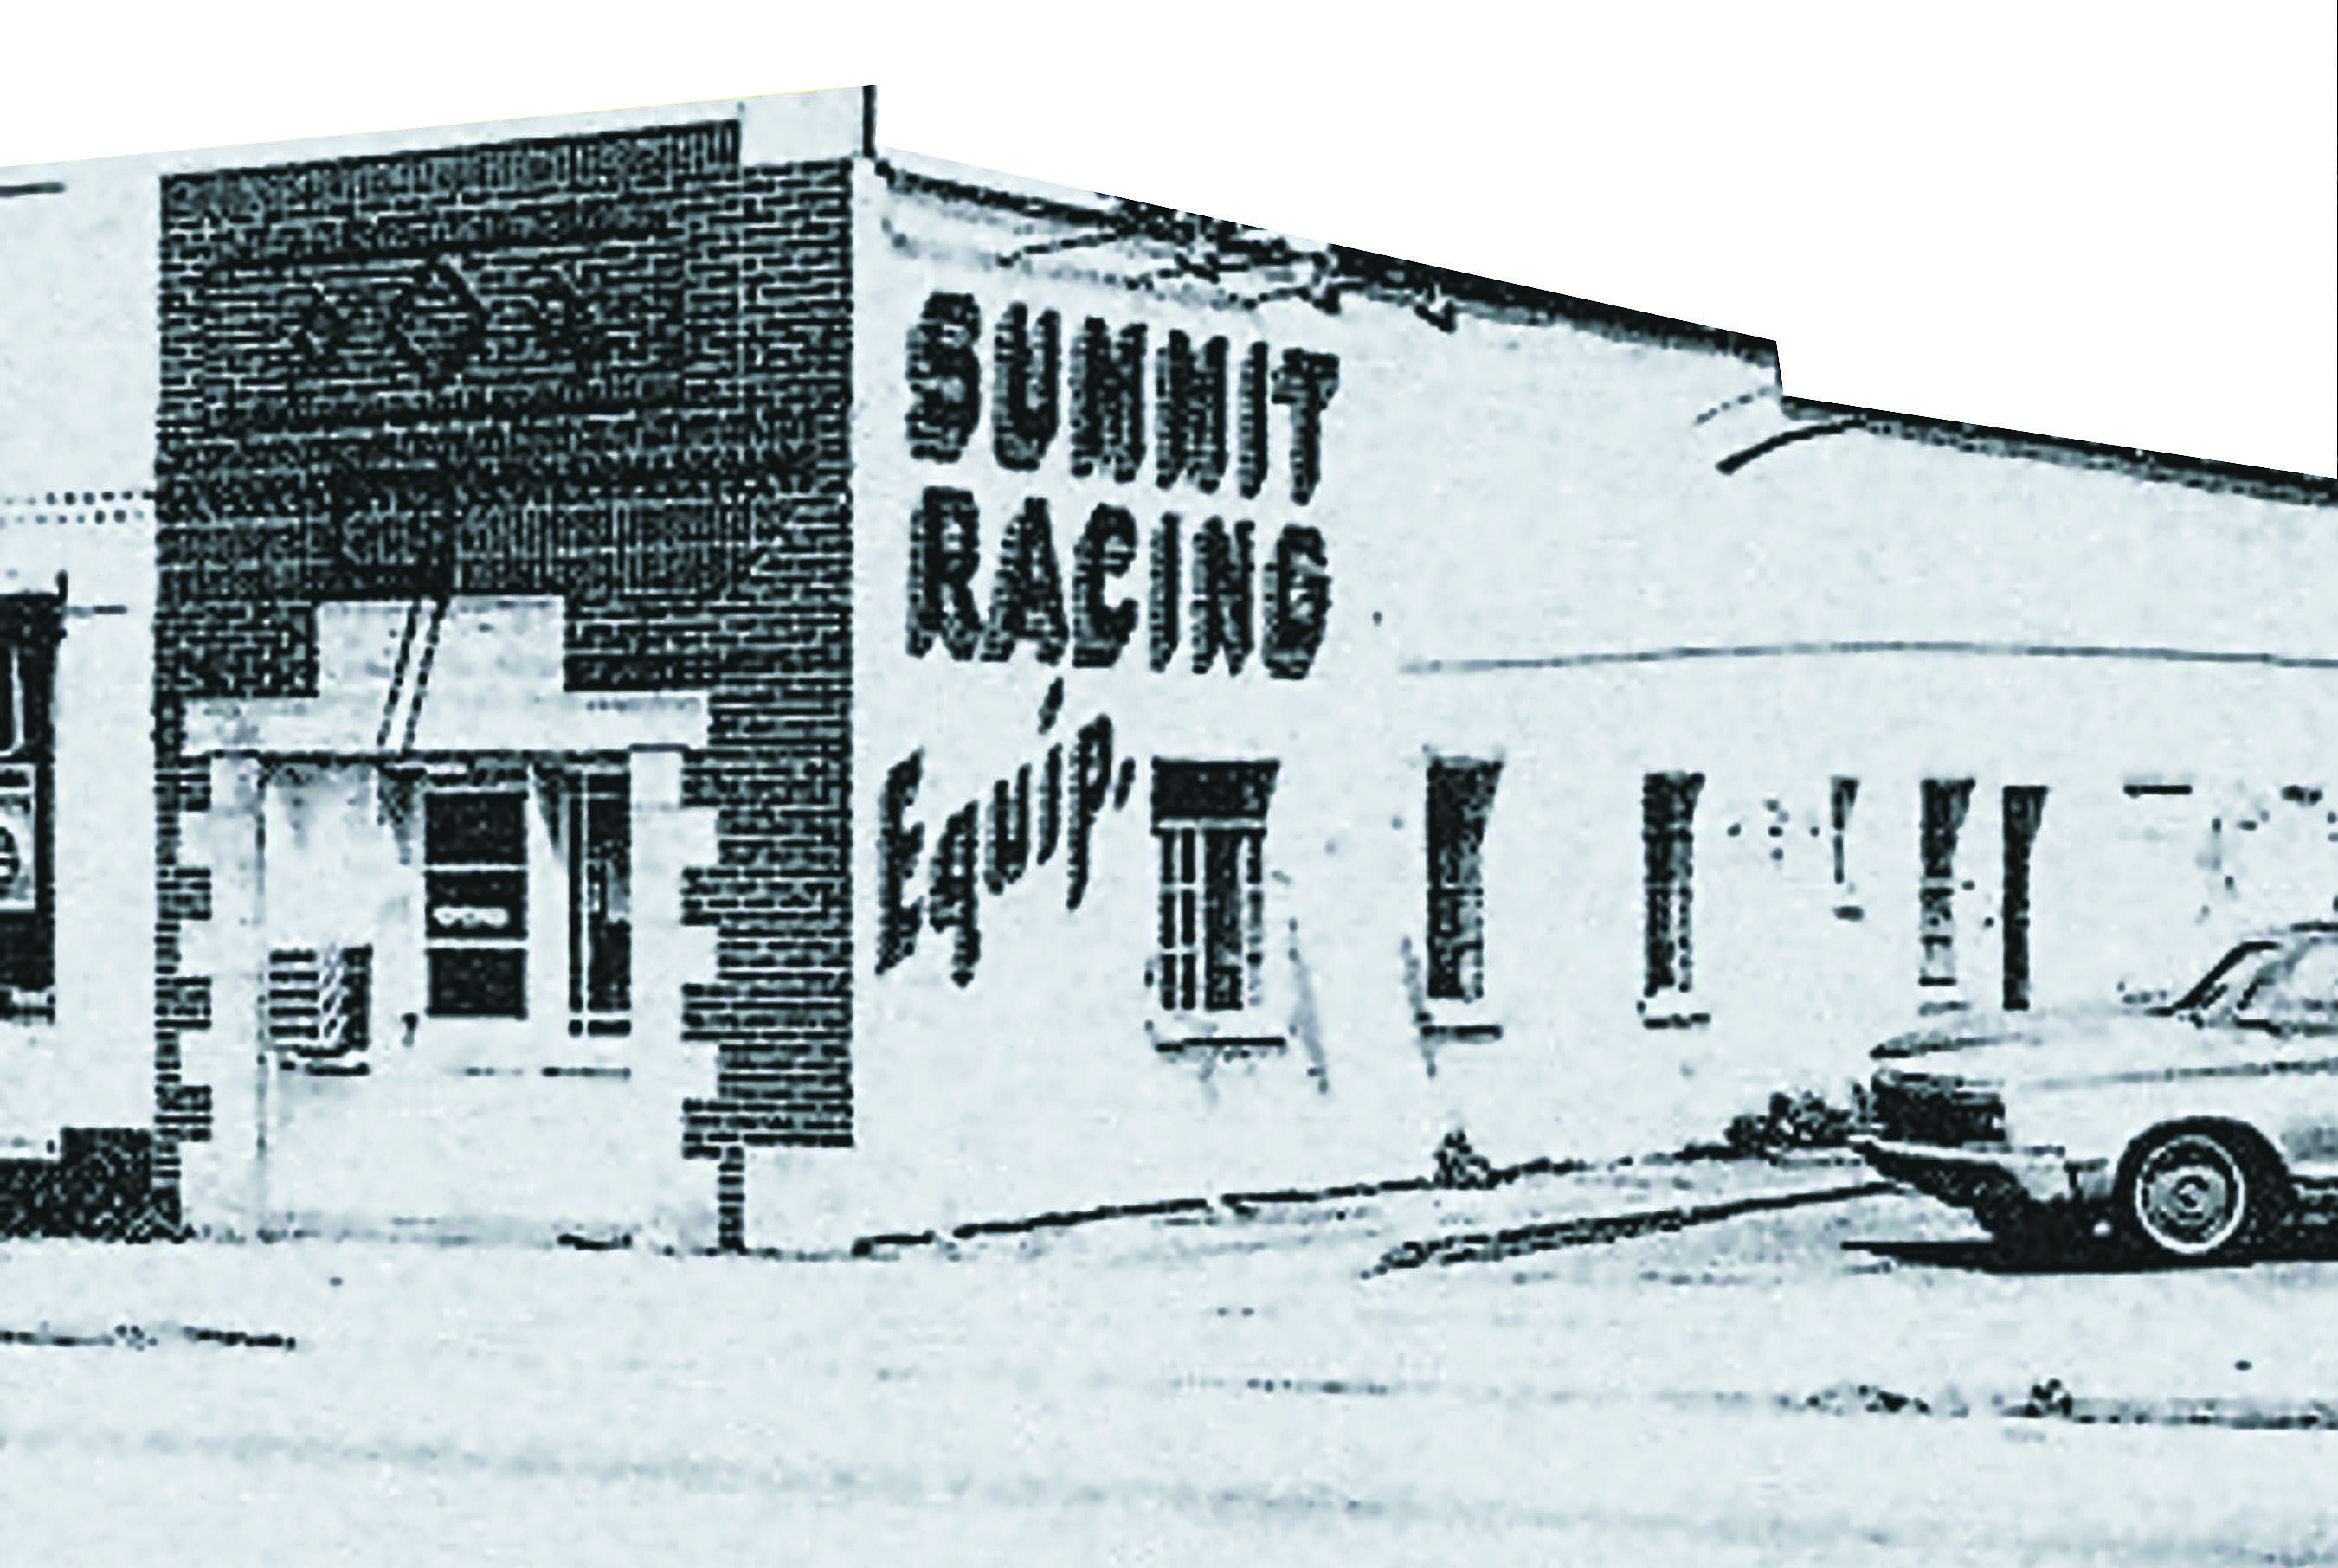 summit racing original store.